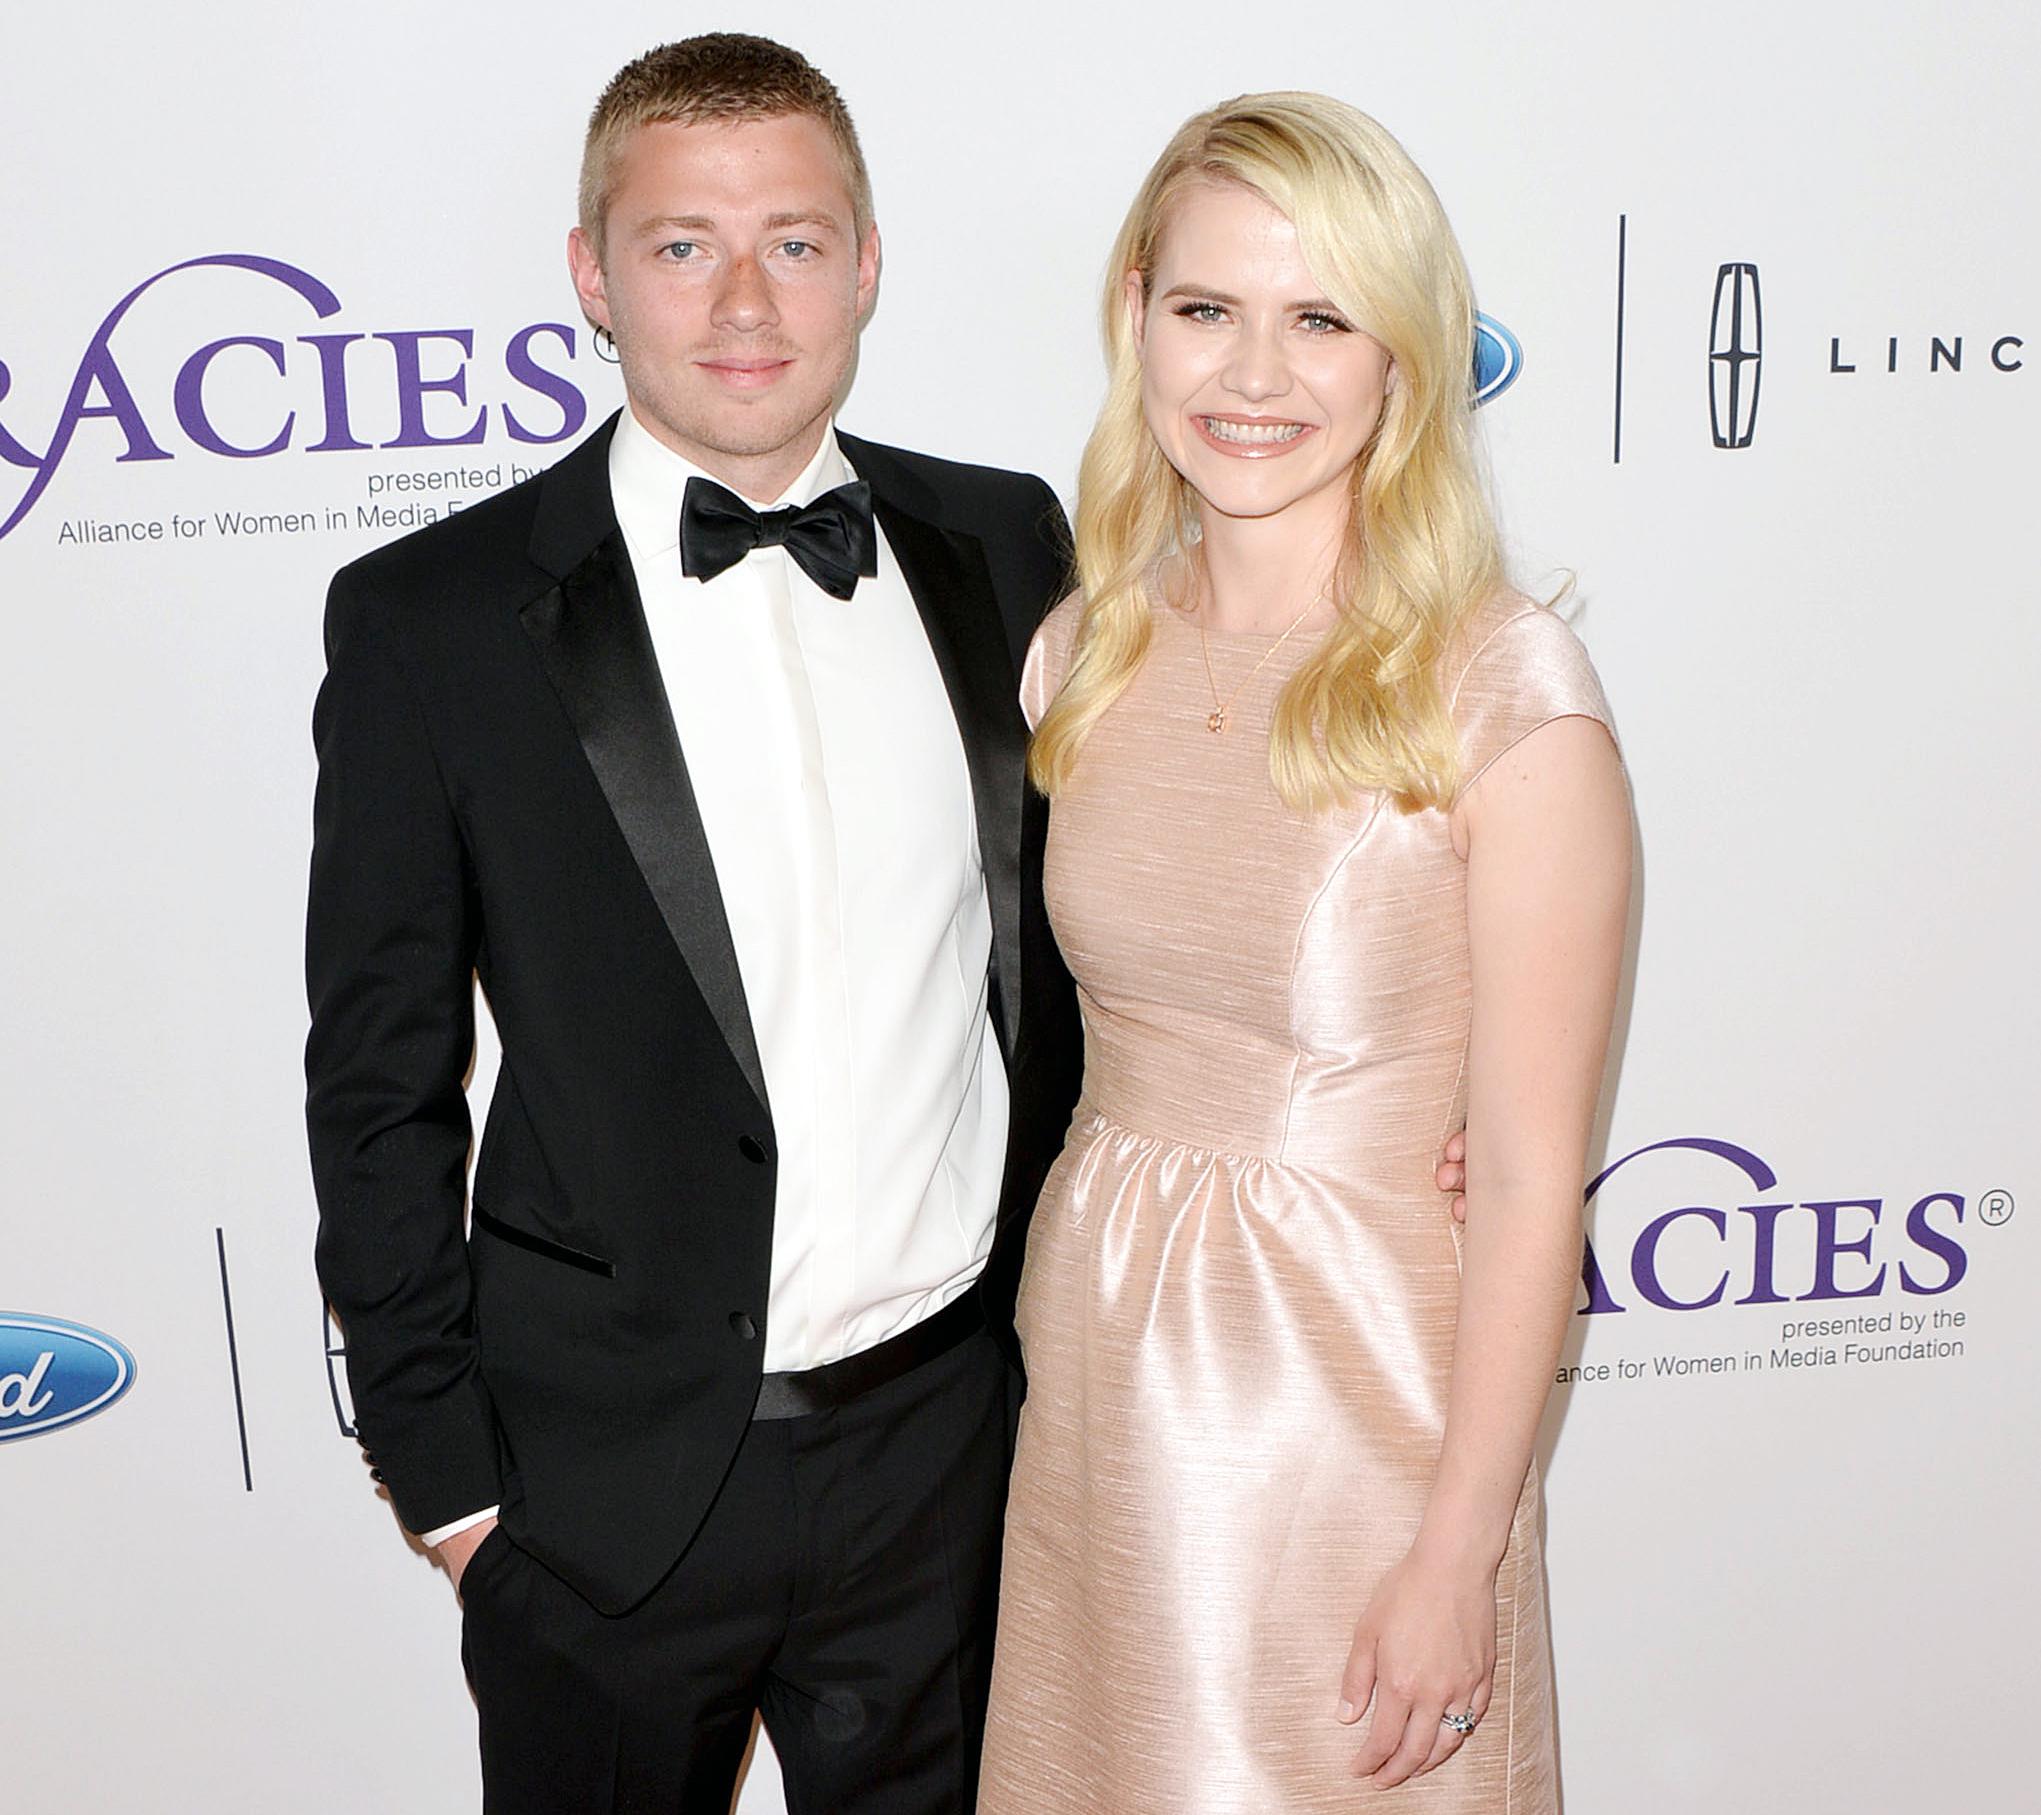 Elizabeth Smart Wedding.Elizabeth Smart Pregnant Expecting Third Child With Matthew Gilmour